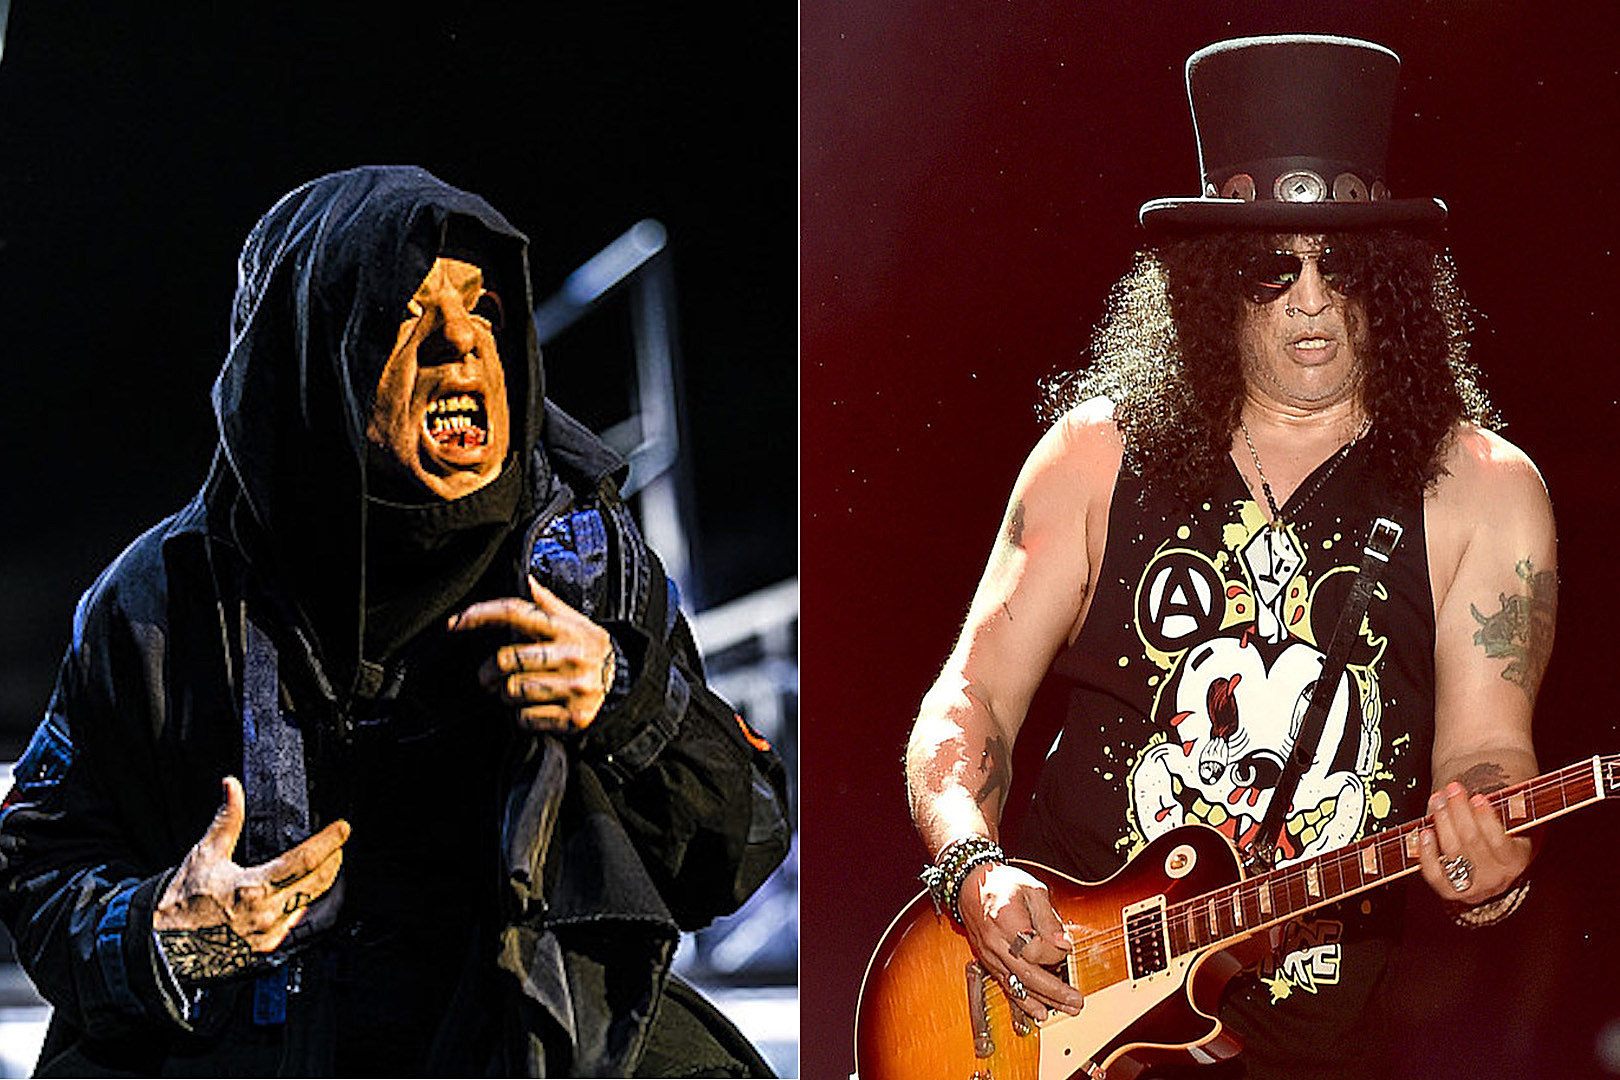 Facebook Now Has Slipknot + Guns N' Roses Face Filters